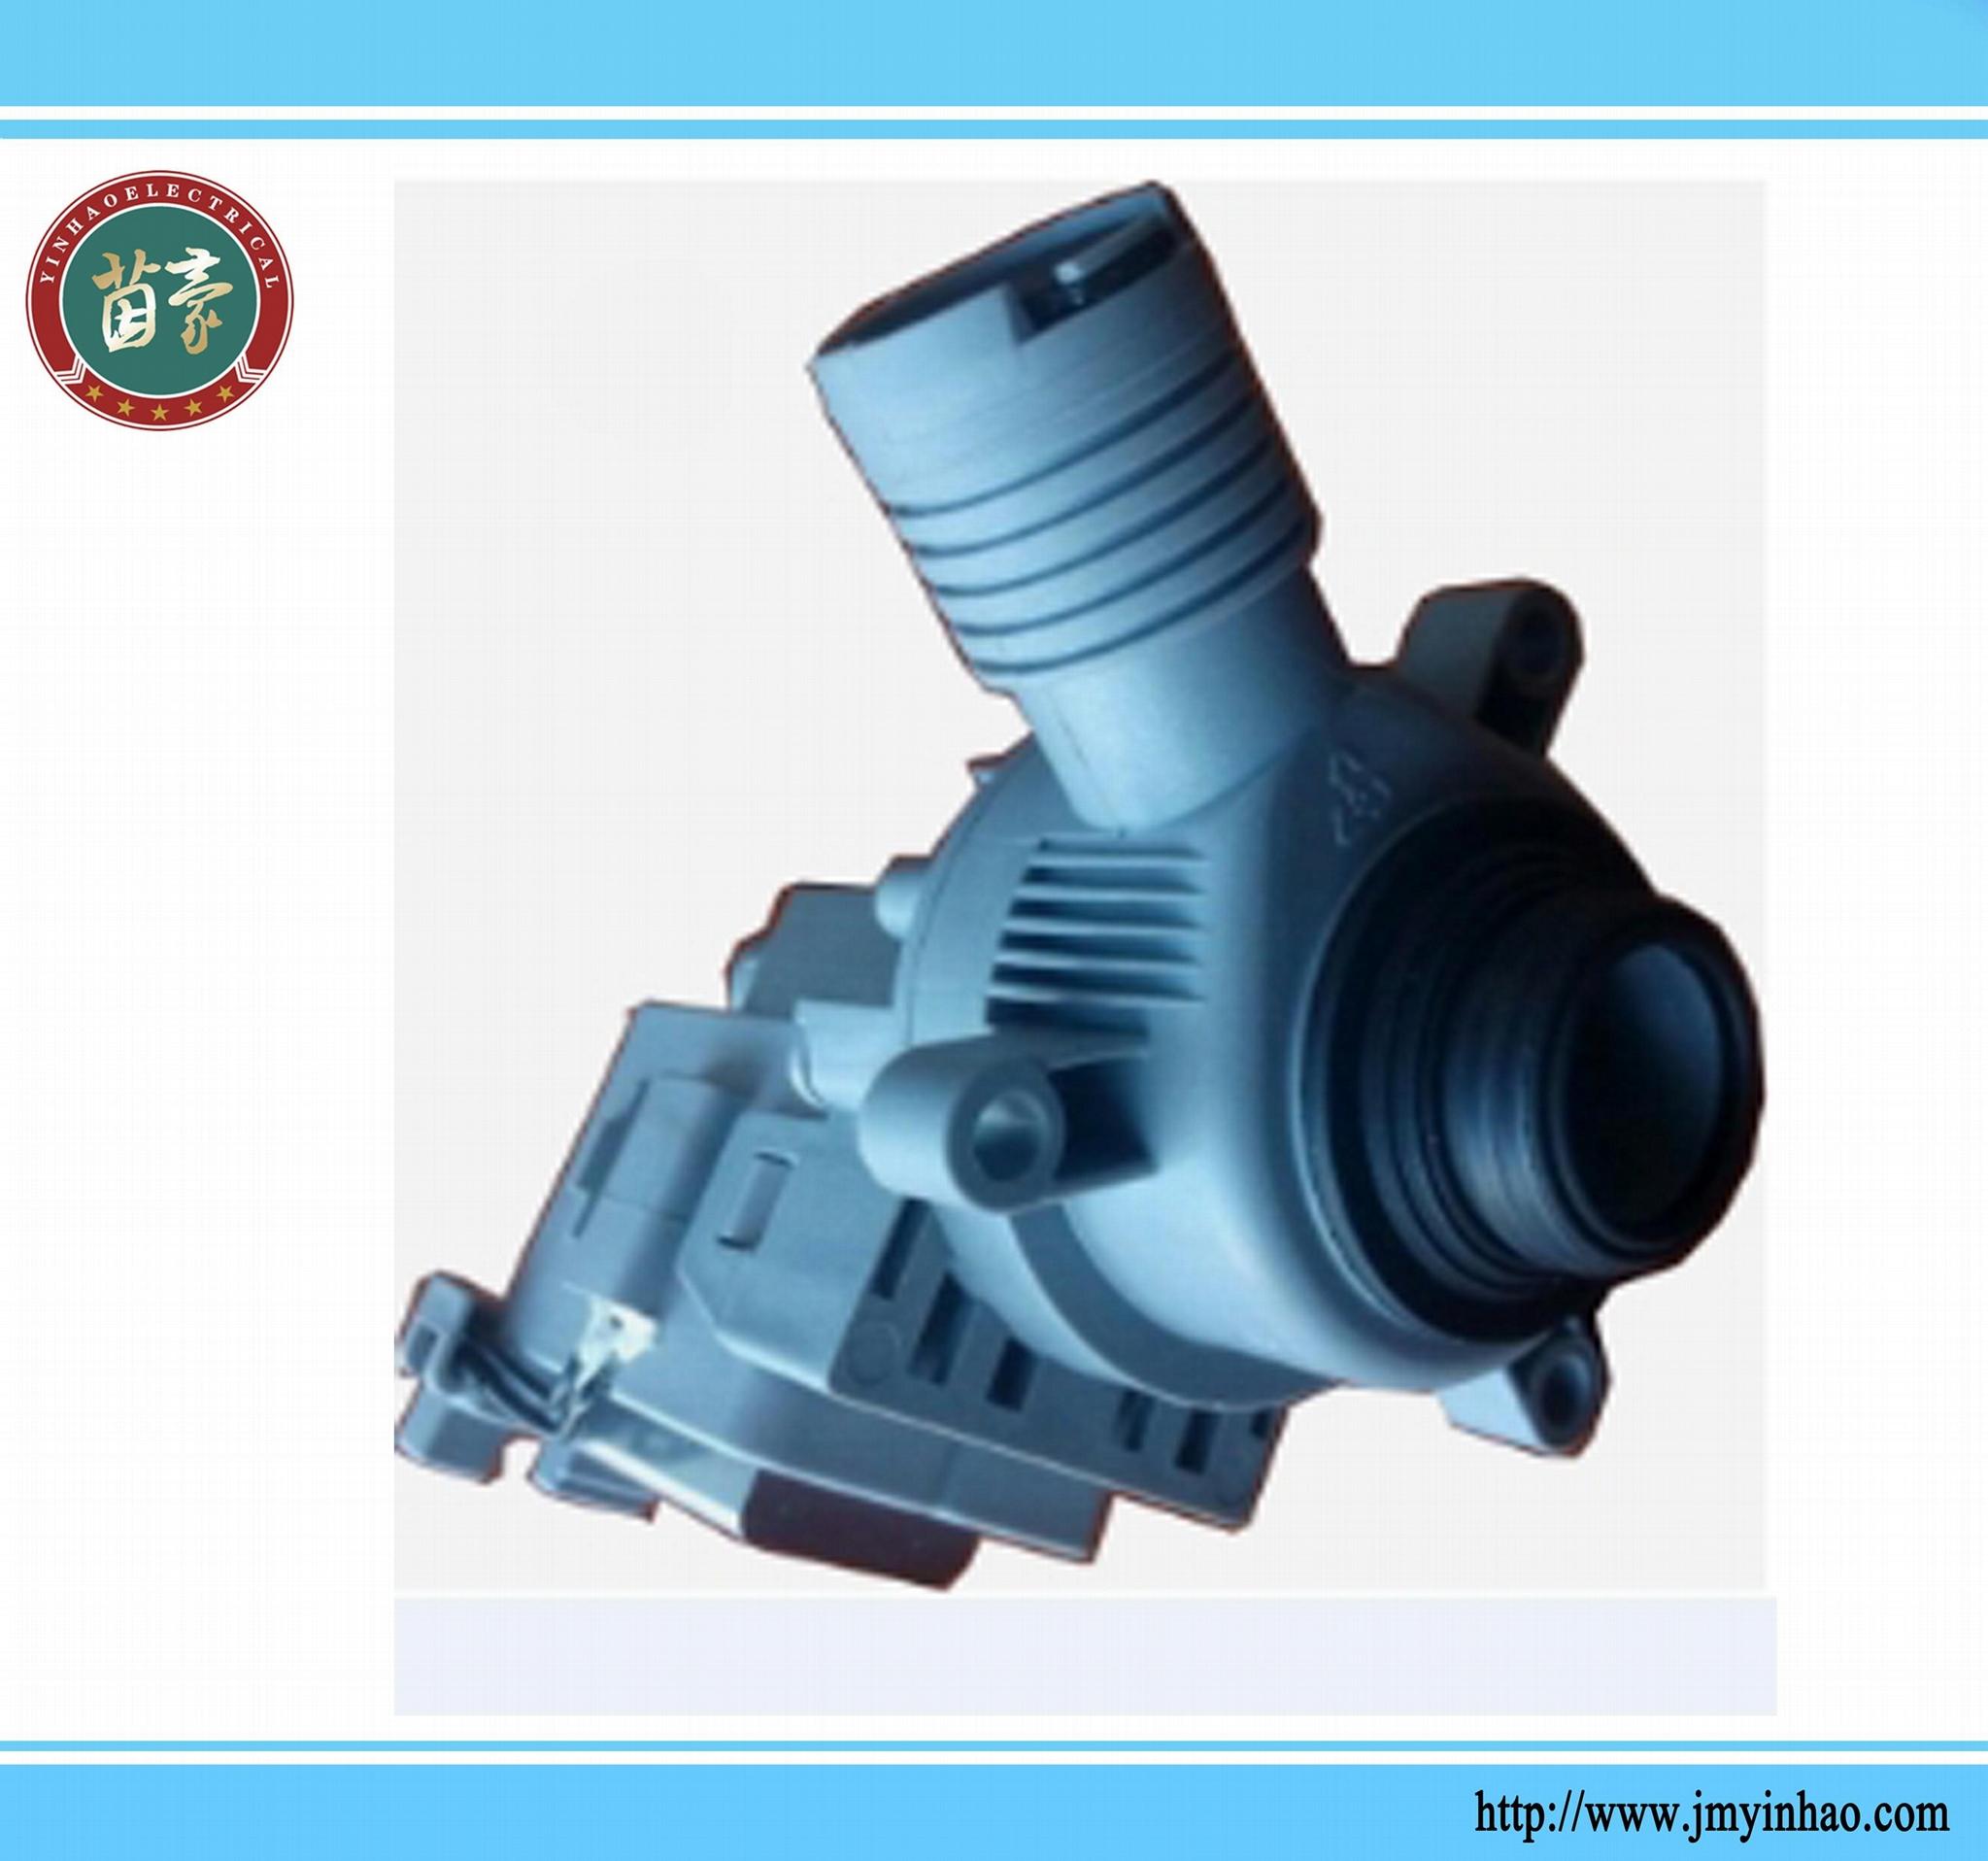 W10276397-Washing Machine Drain Pump for Whirlpool NEW OEM 1